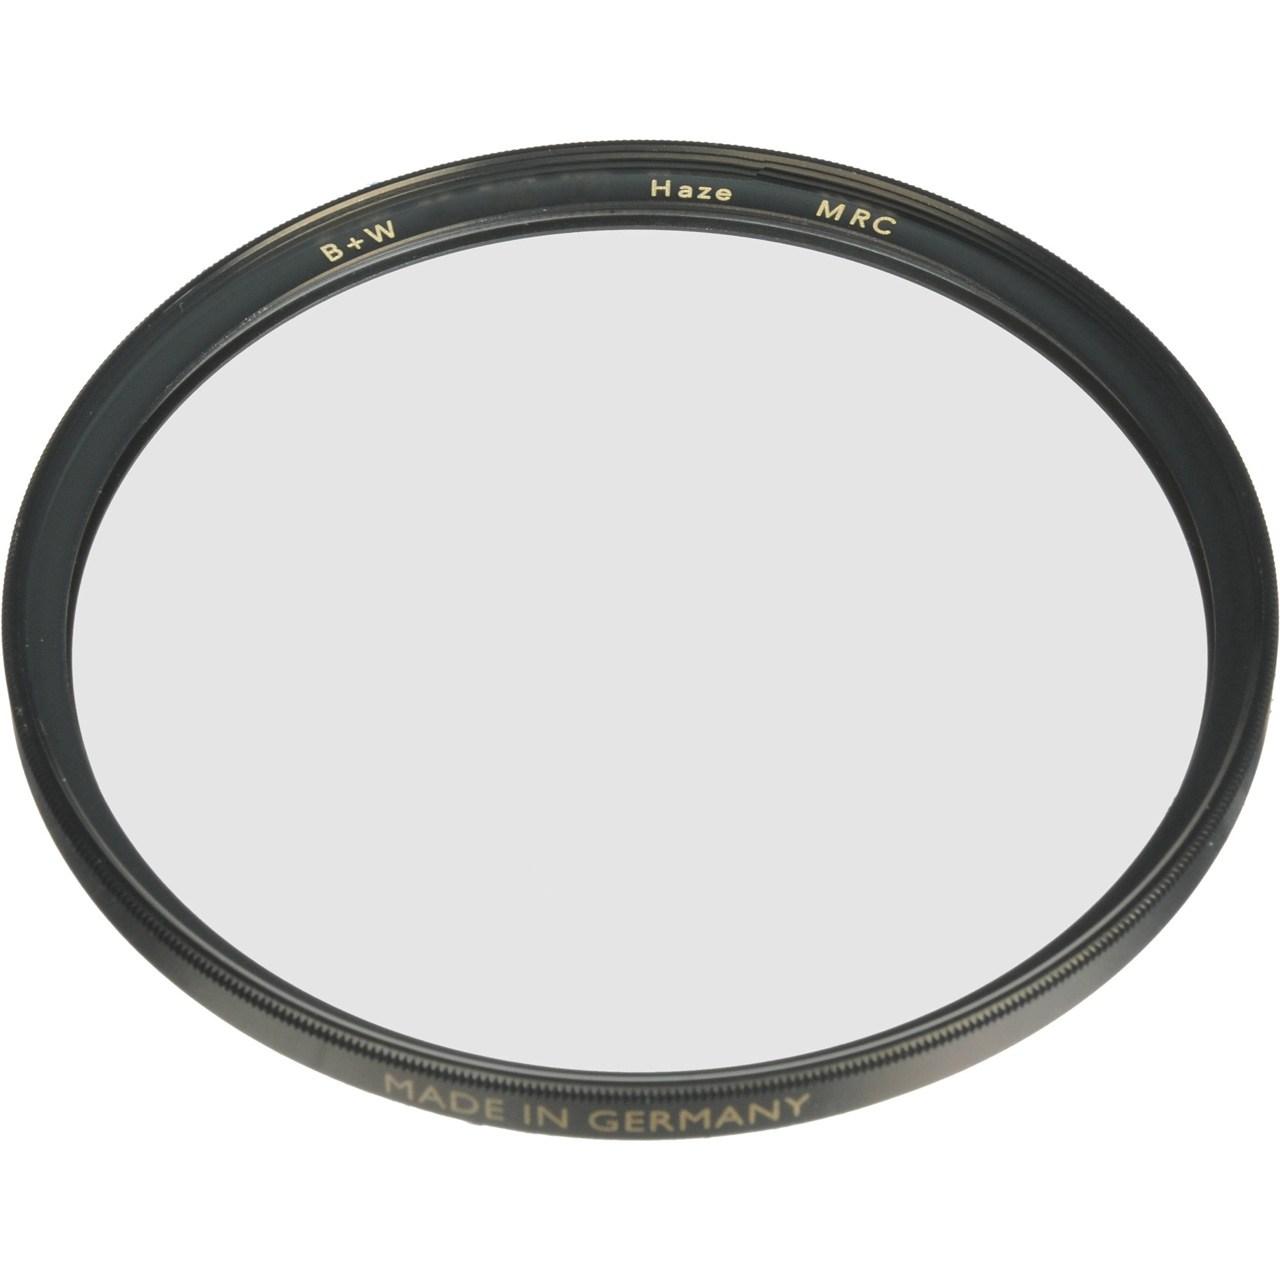 فیلتر لنز B+W مدل UV 77mm